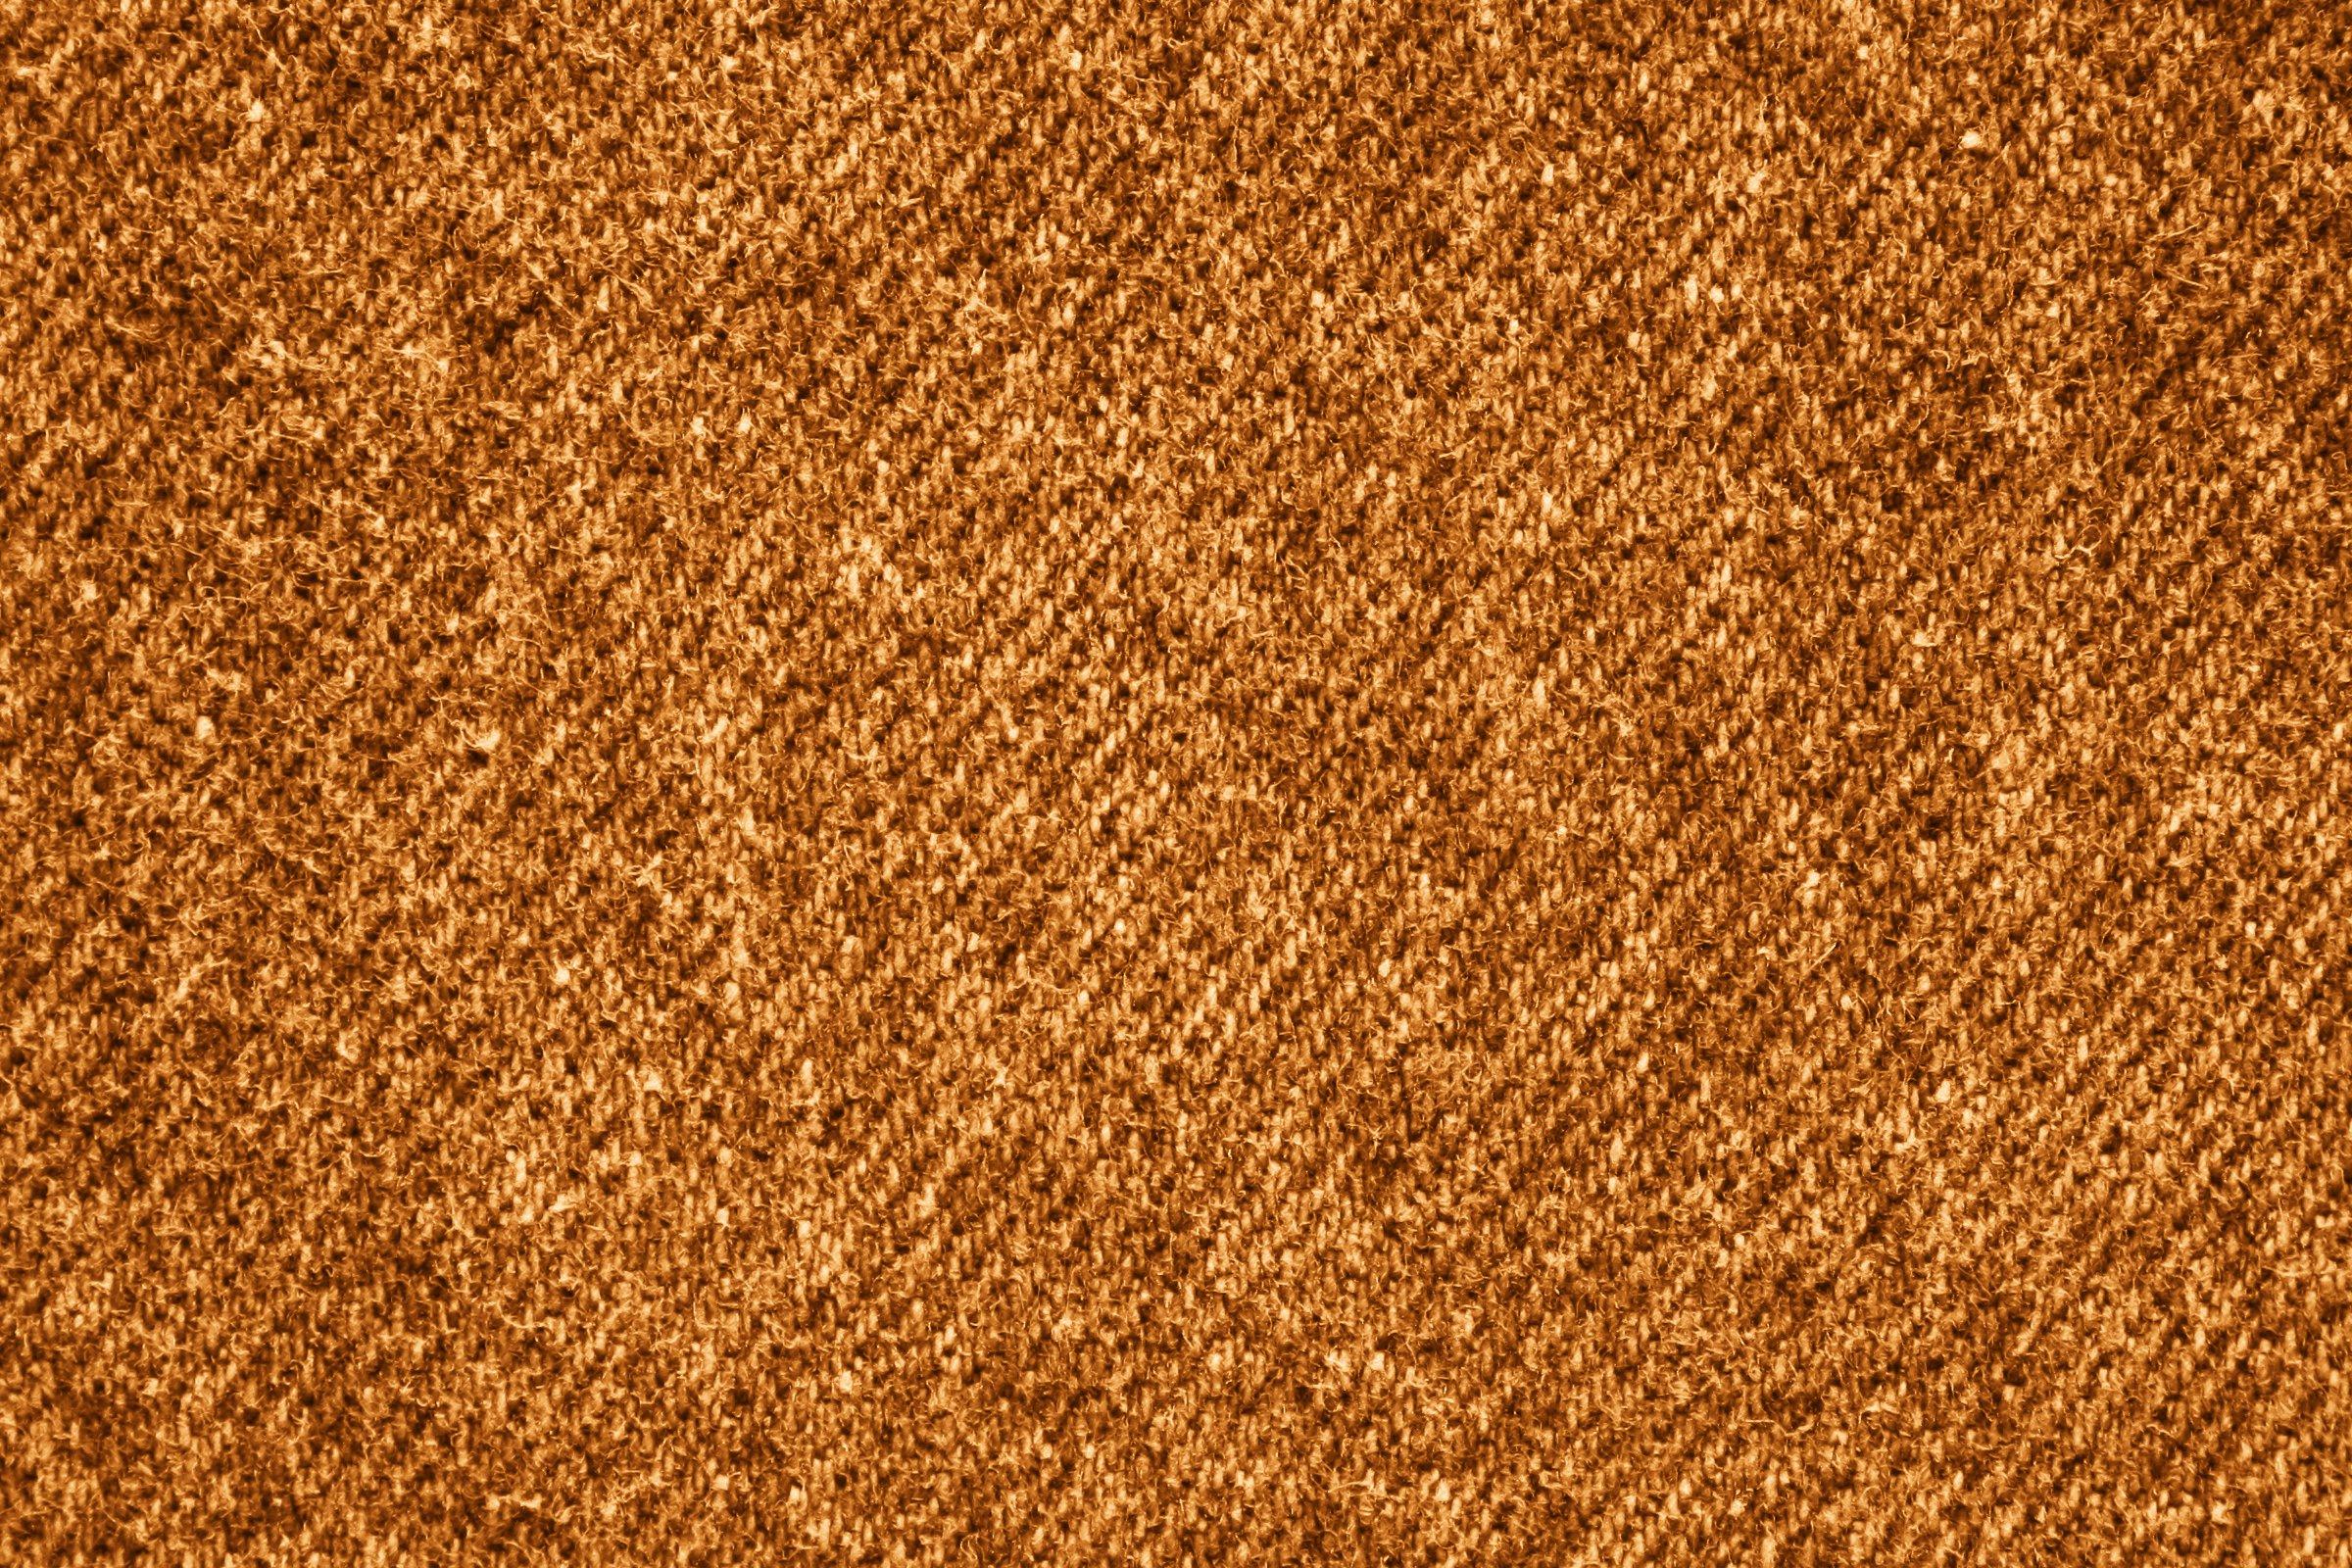 Orange Denim Fabric Texture Picture | Free Photograph | Photos ...